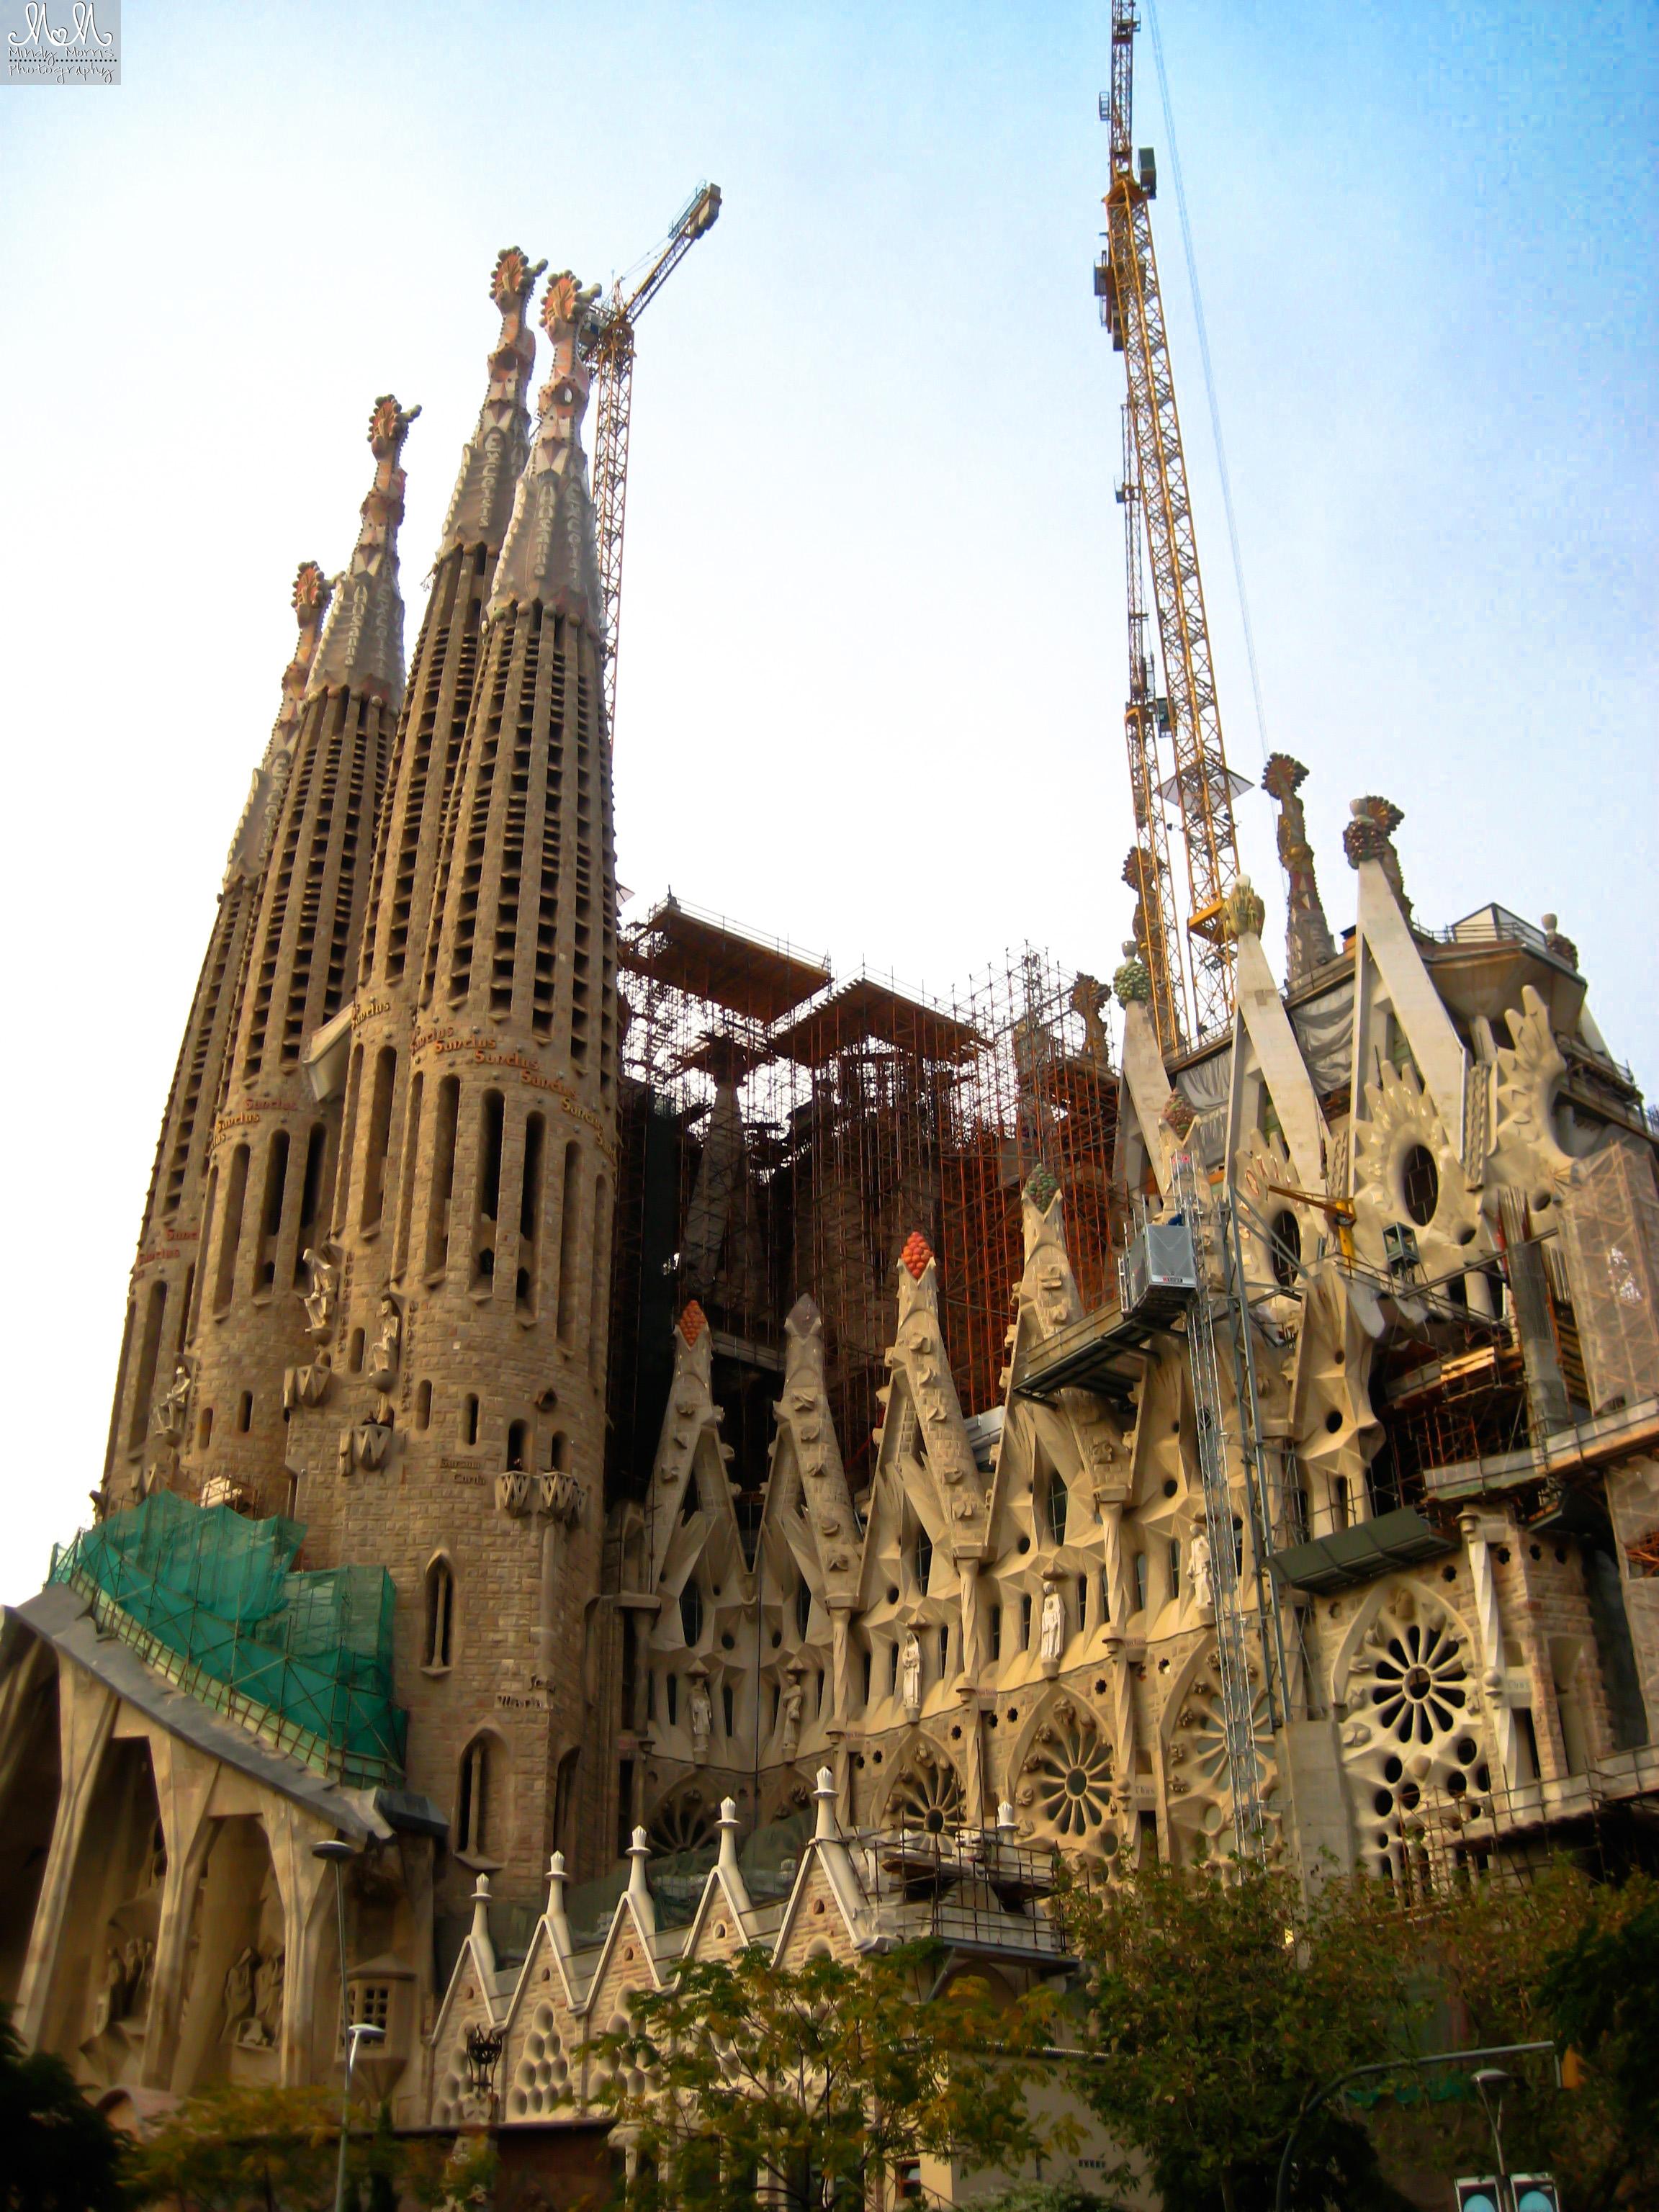 Barcelona, Gaudi, Sagrada Familia